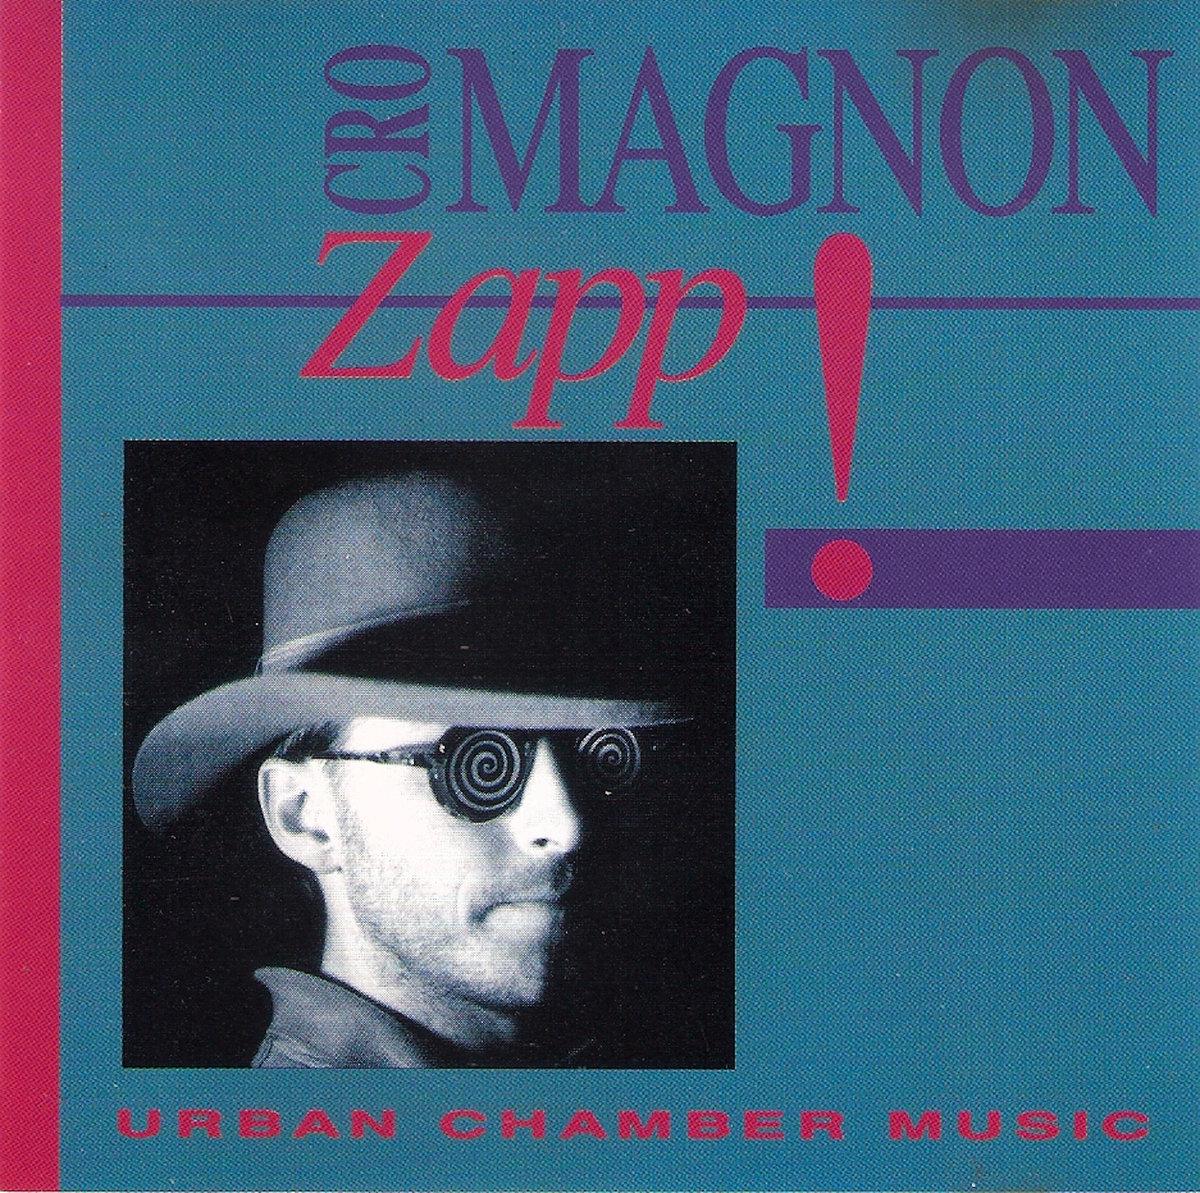 Cro Magnon: Zapp!【予約受付中】